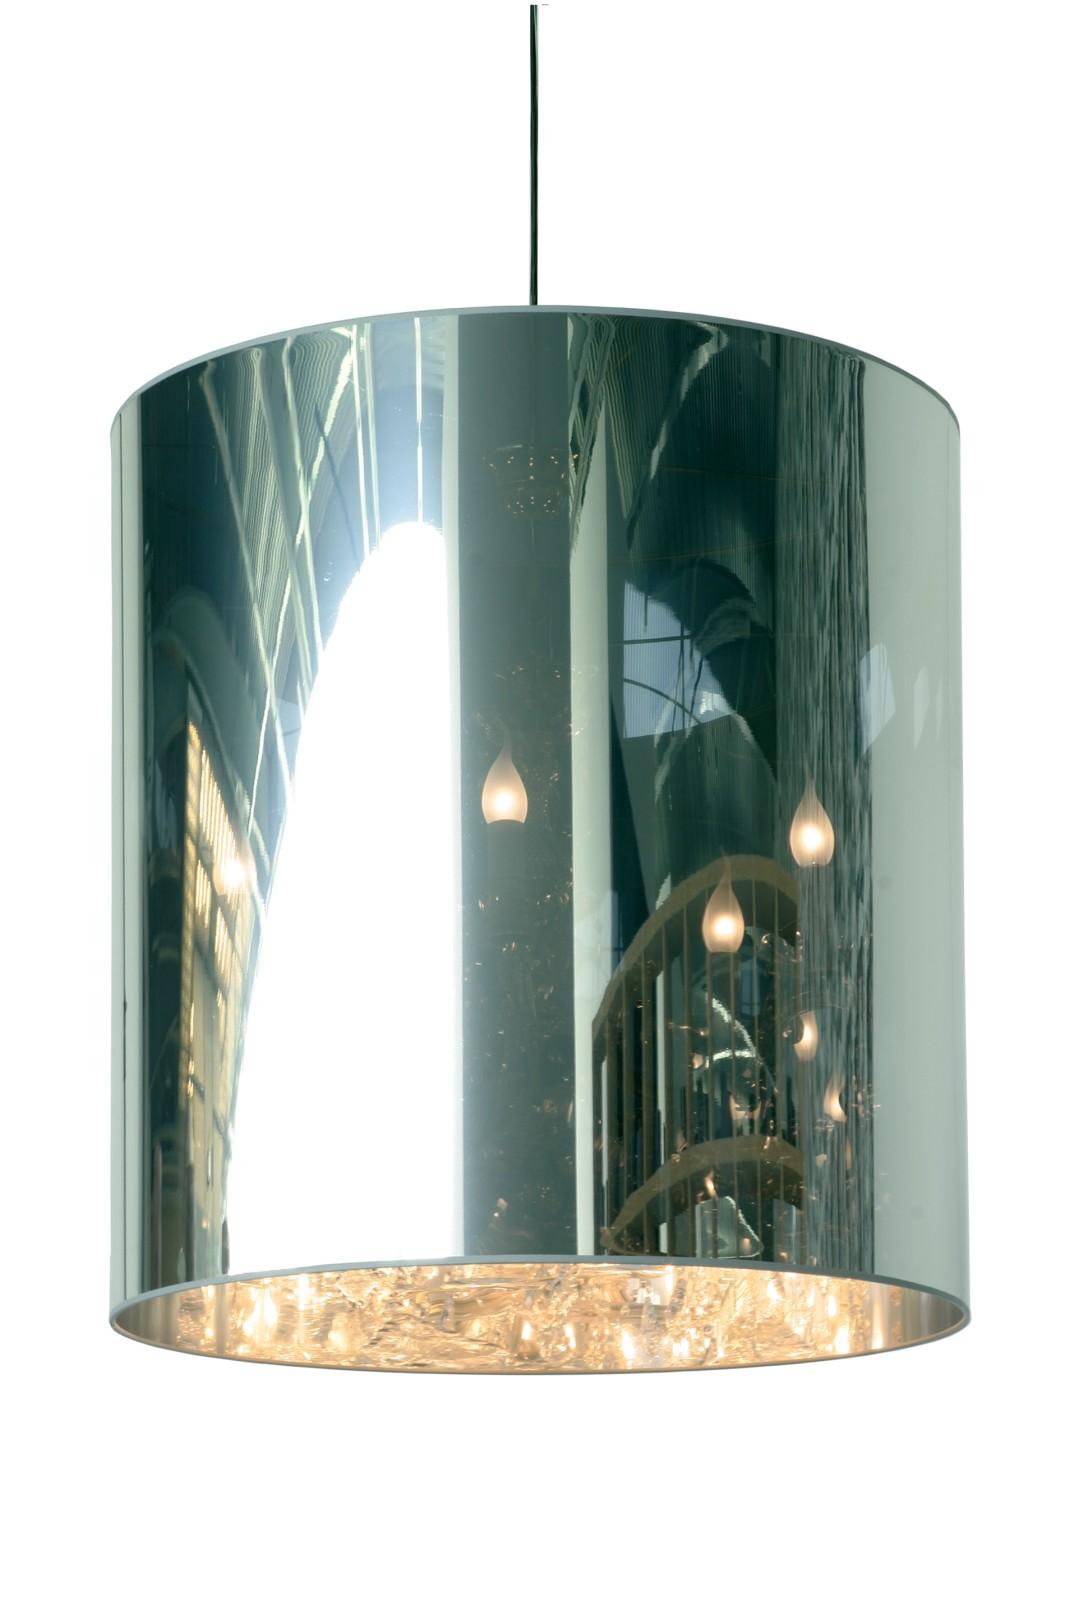 Light Shade Shade Pendant Light - 70cm